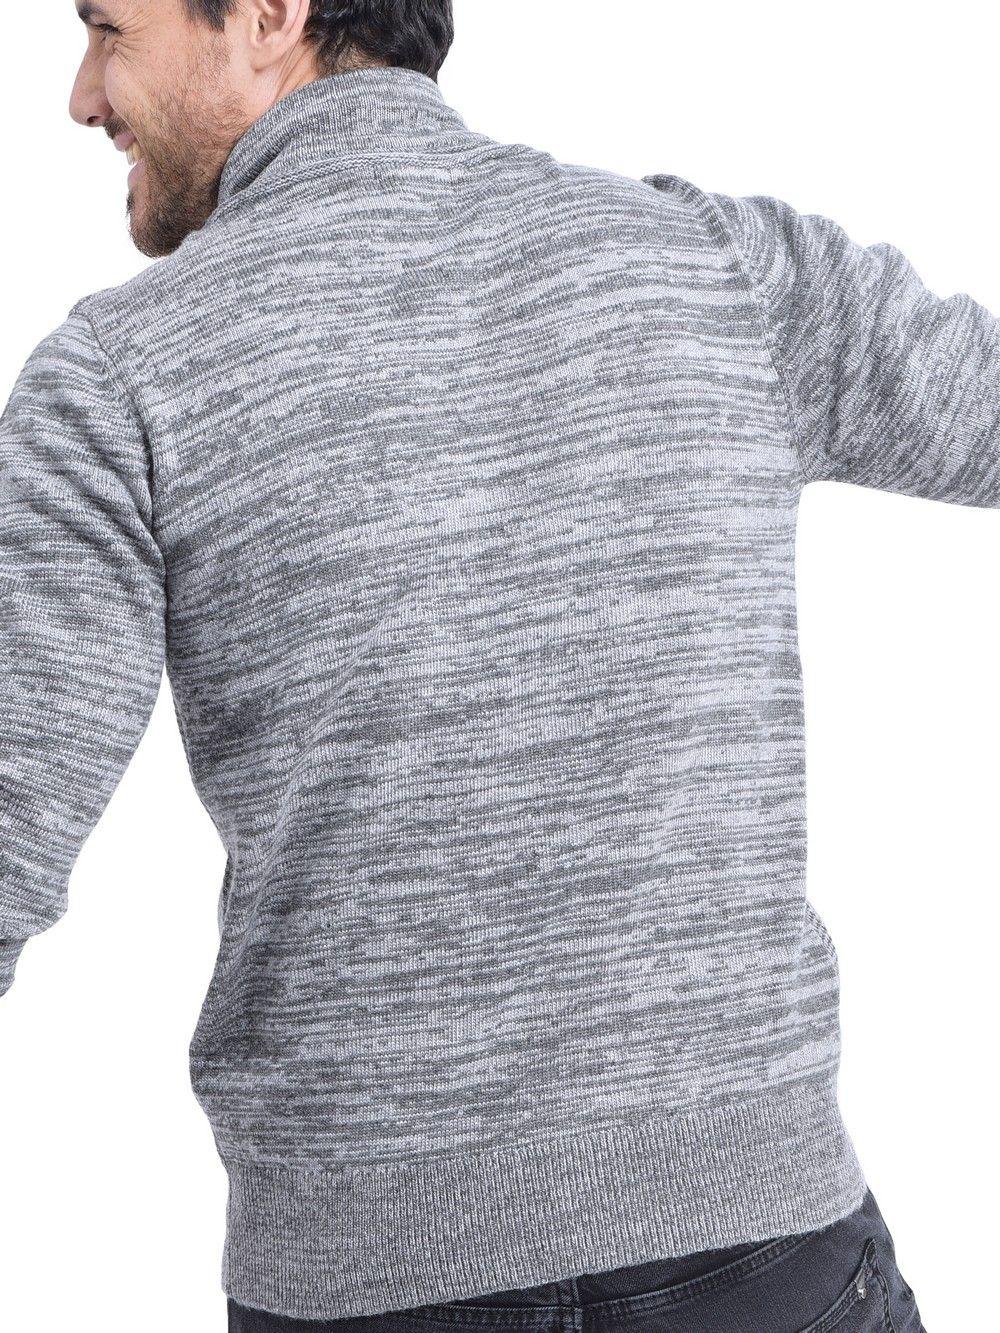 C&JO Shawl Collar Jacquard Sweater with Cords in Grey